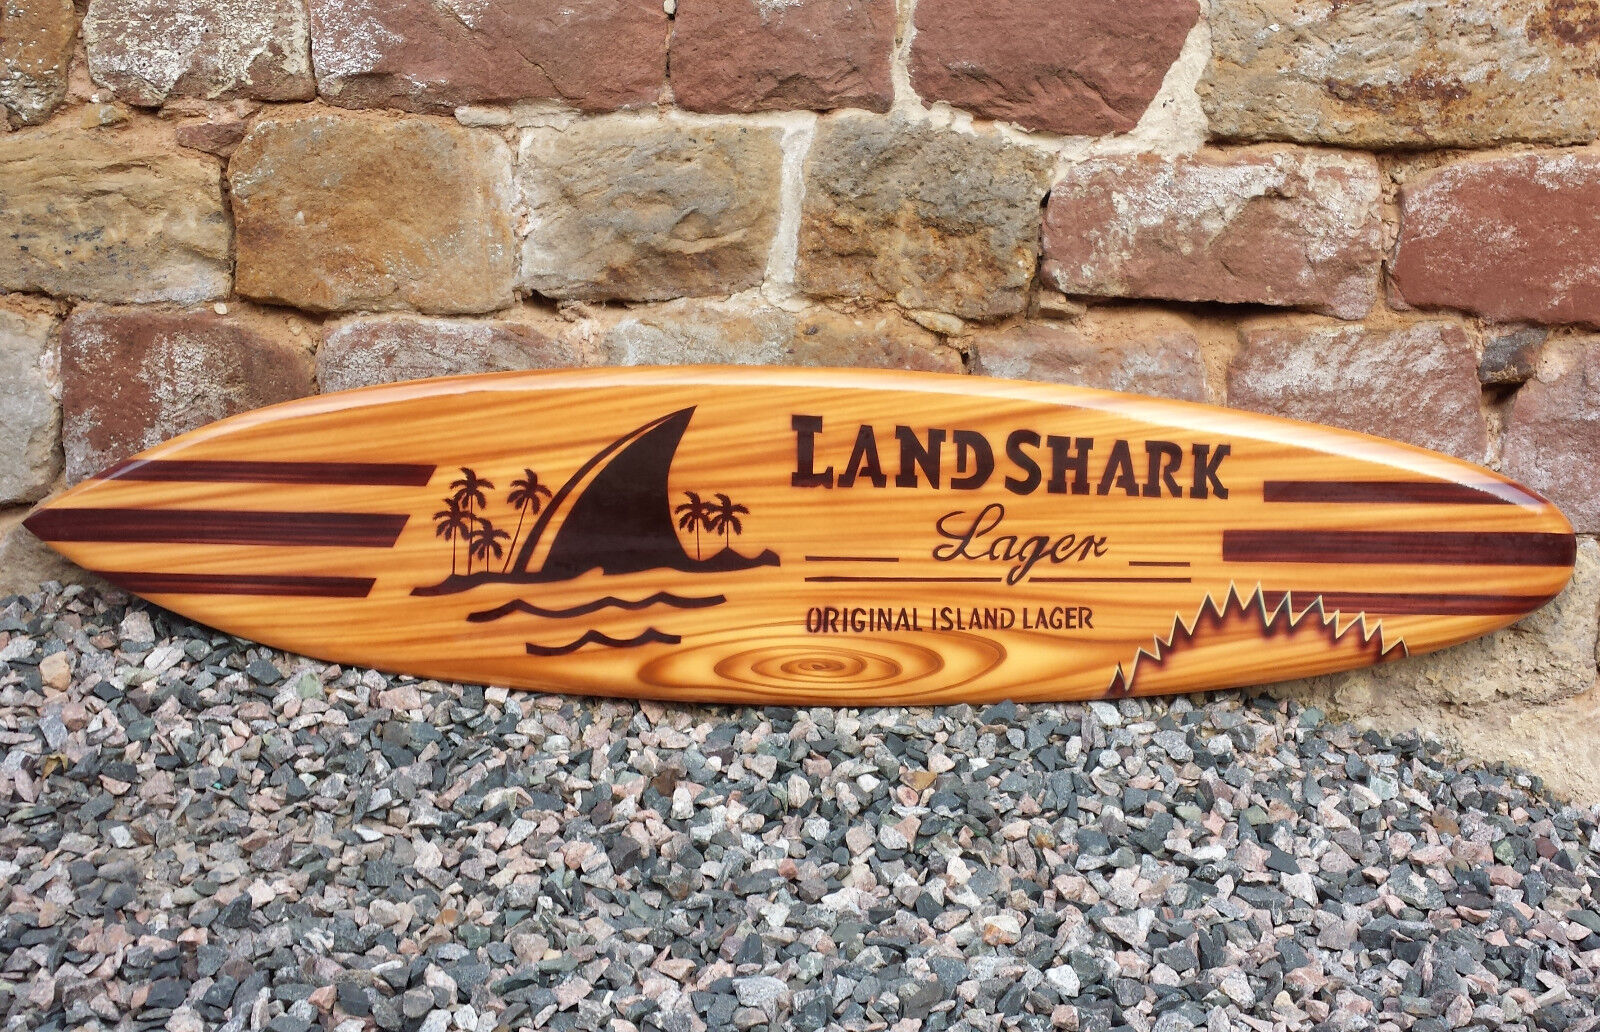 SU 100 N10 P (du)   Deko Surfboard Surfboard Surfboard , Surfbrett, 100cm Holz Dekosurfboard retro 7e2fa3